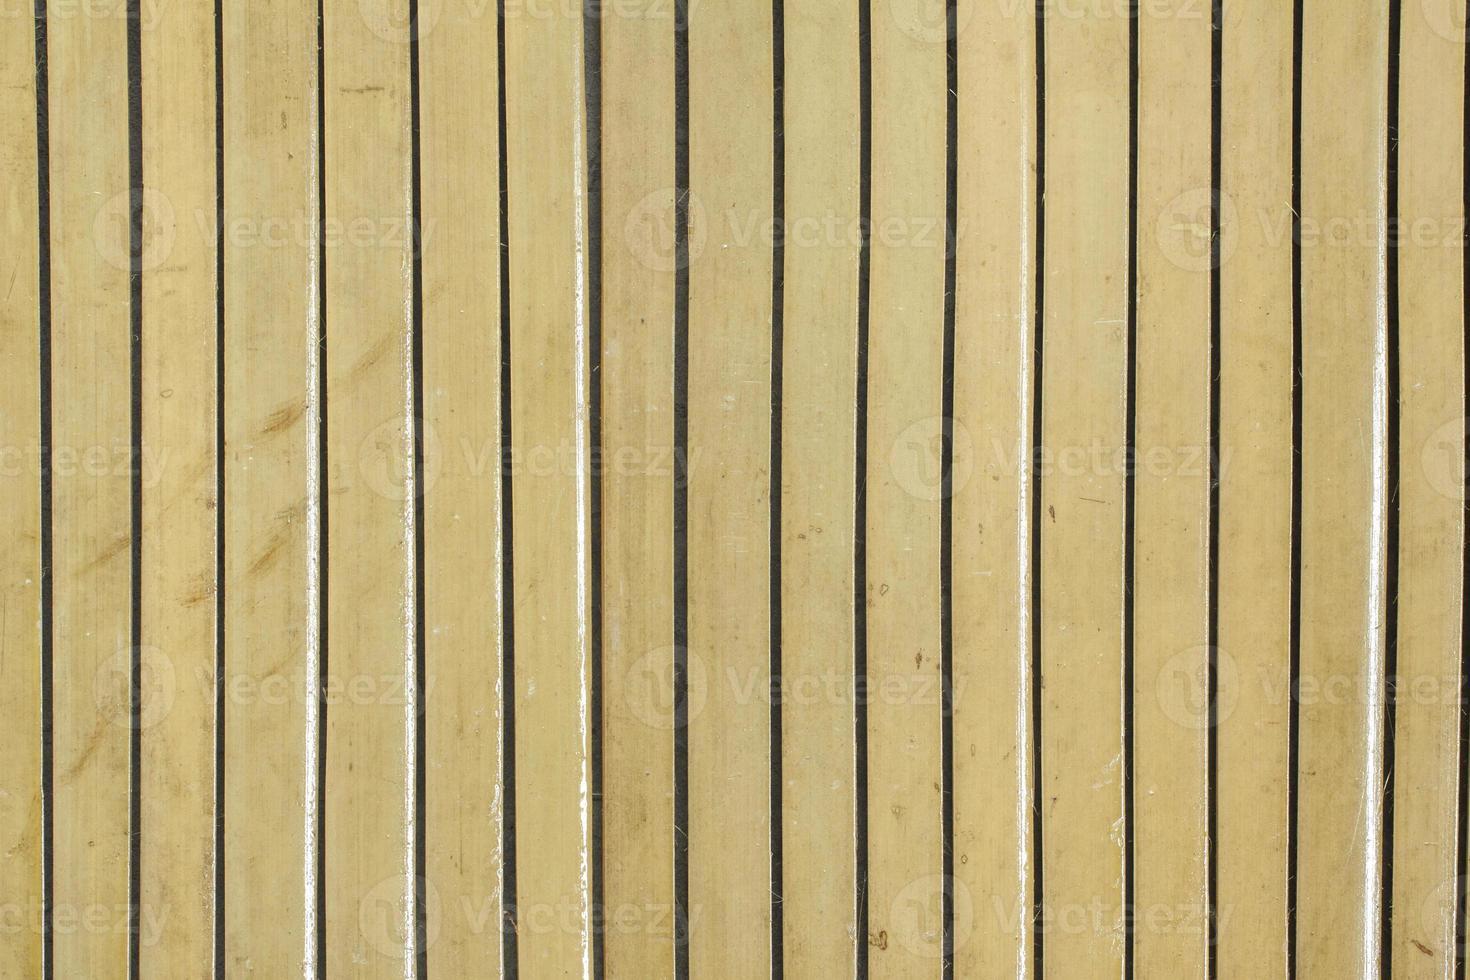 Bambus Textur foto